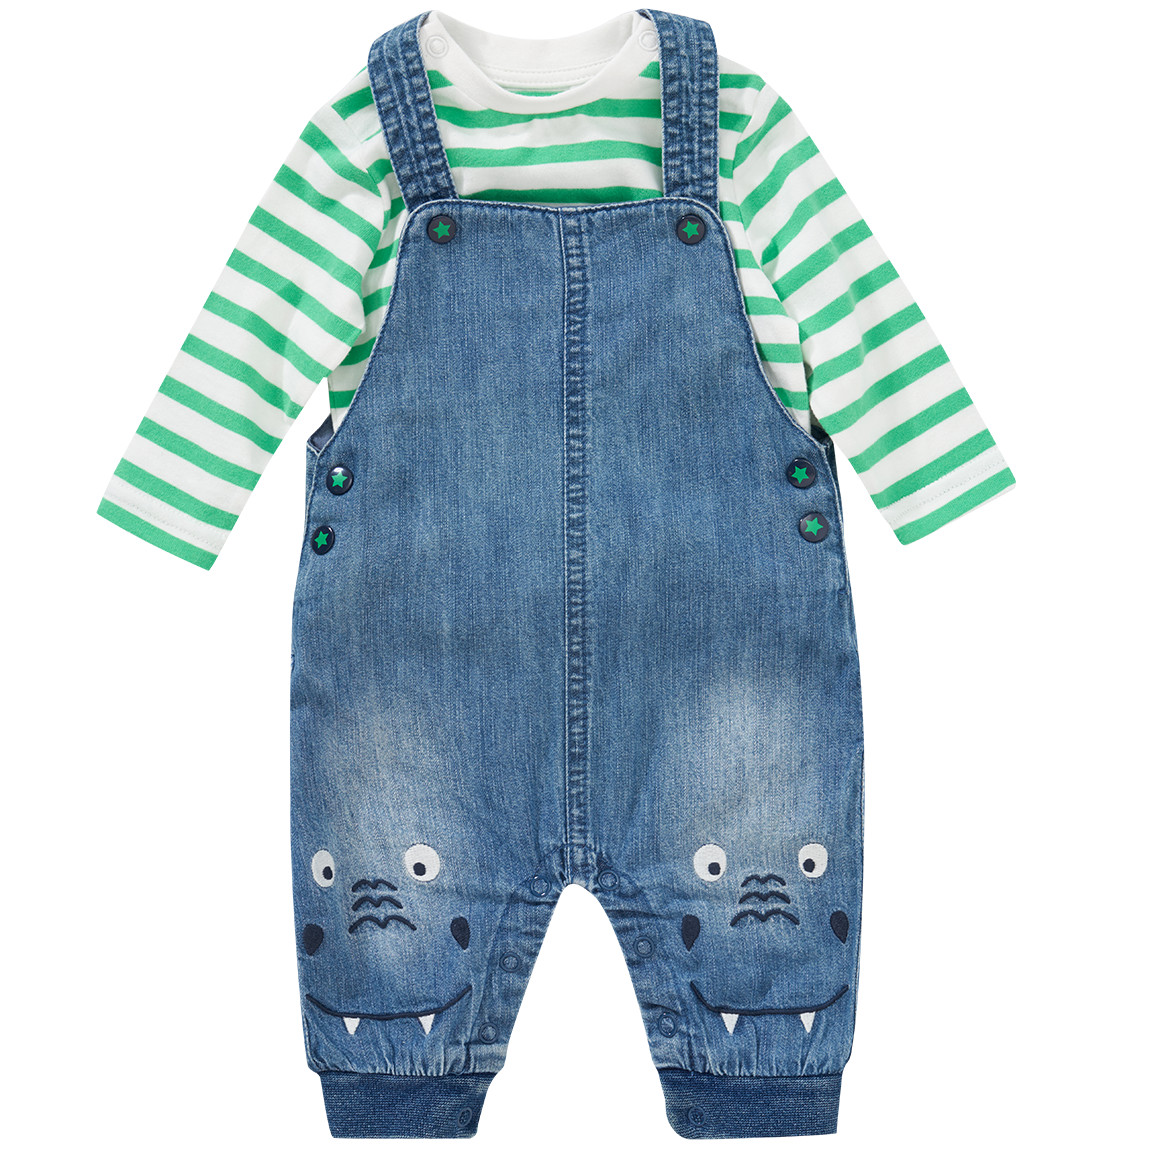 Babysets - Newborn Latzhose und Langarmshirt im Set - Onlineshop Ernstings family